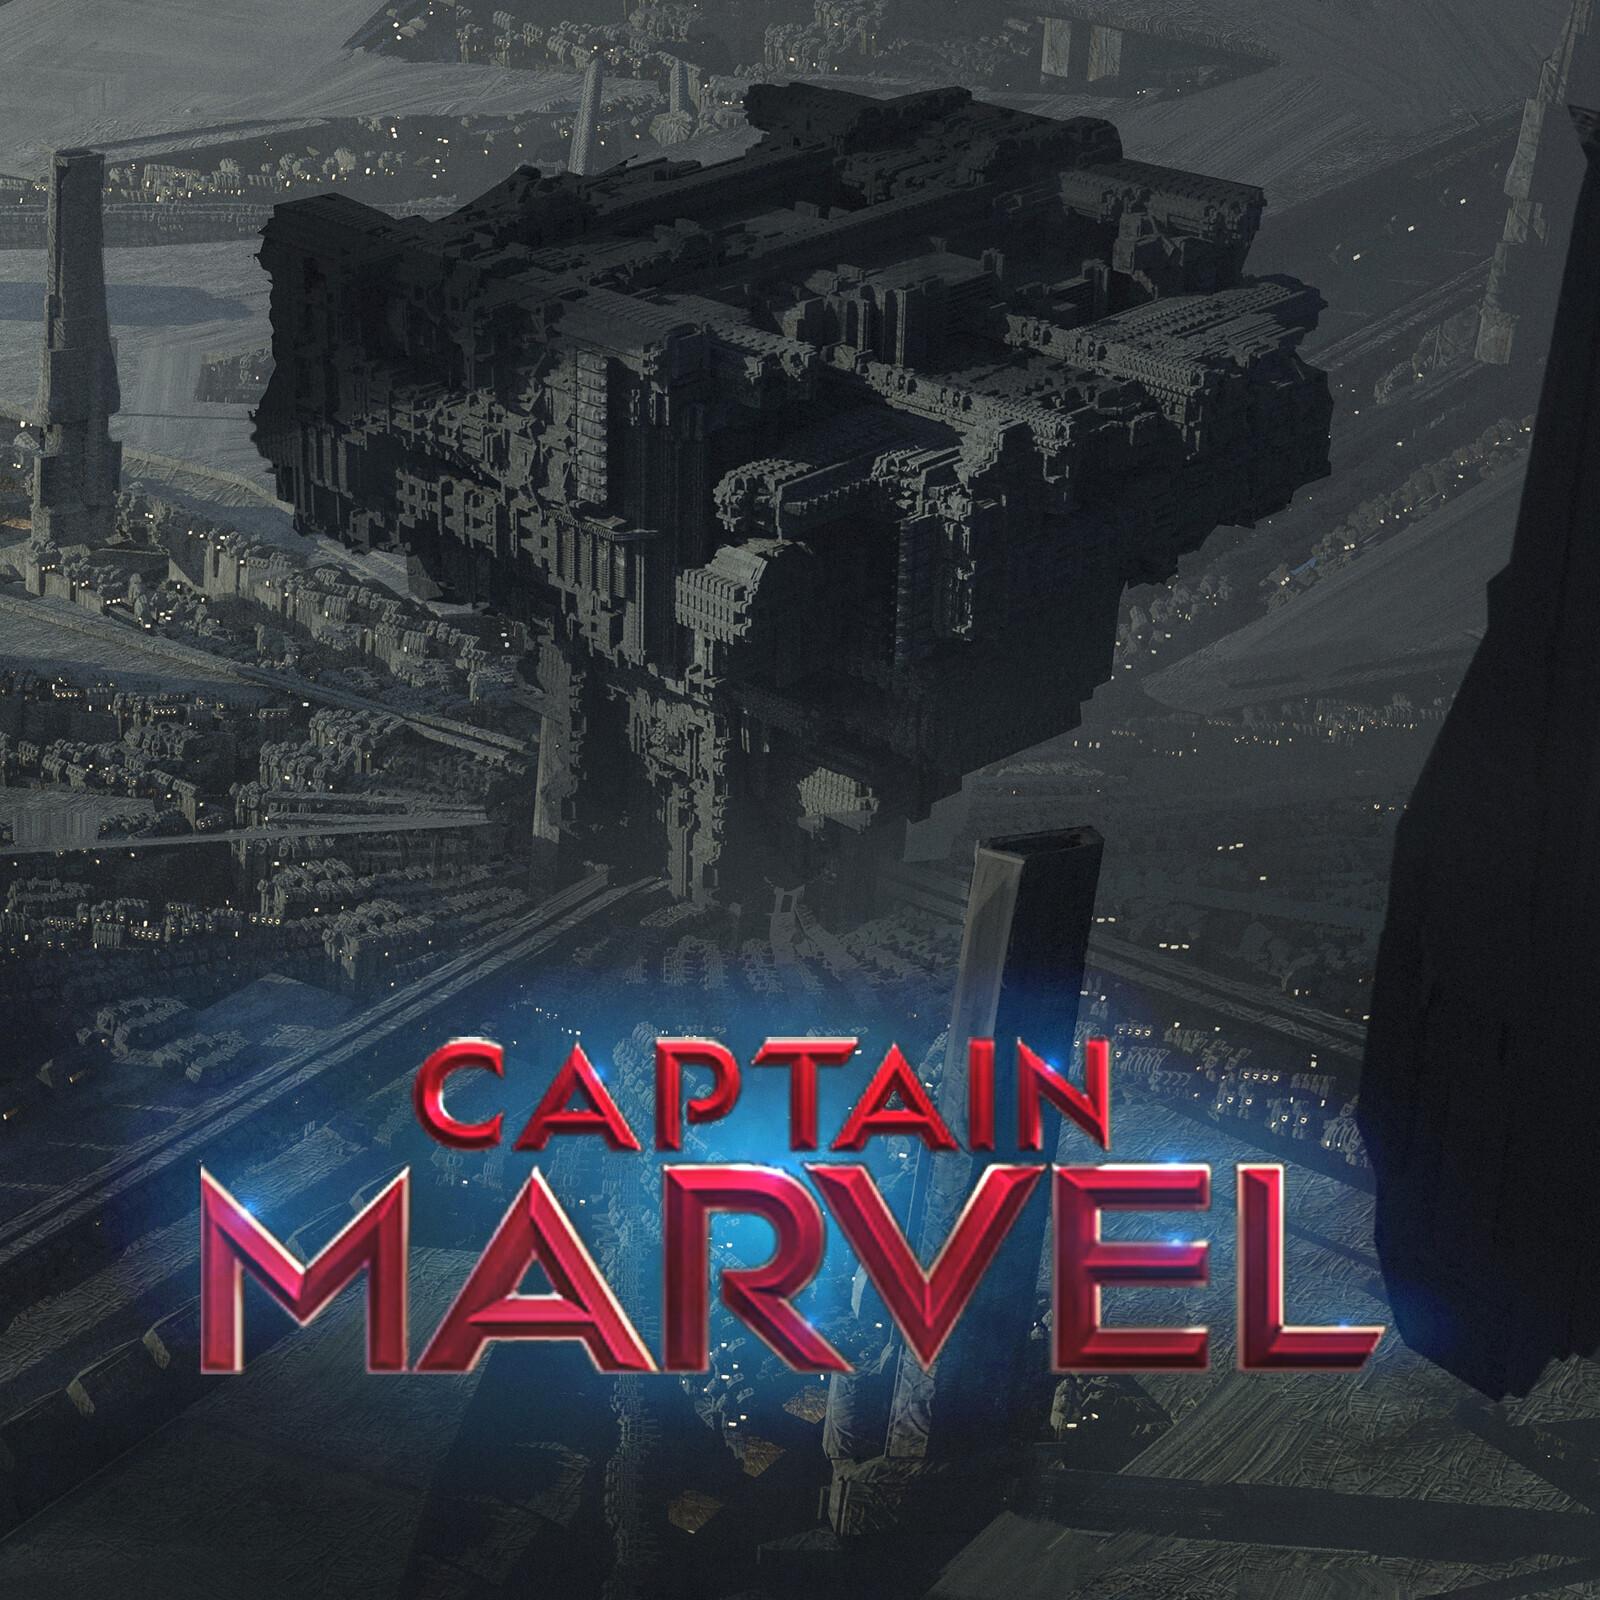 Captain Marvel Halacity / MARVEL Machine